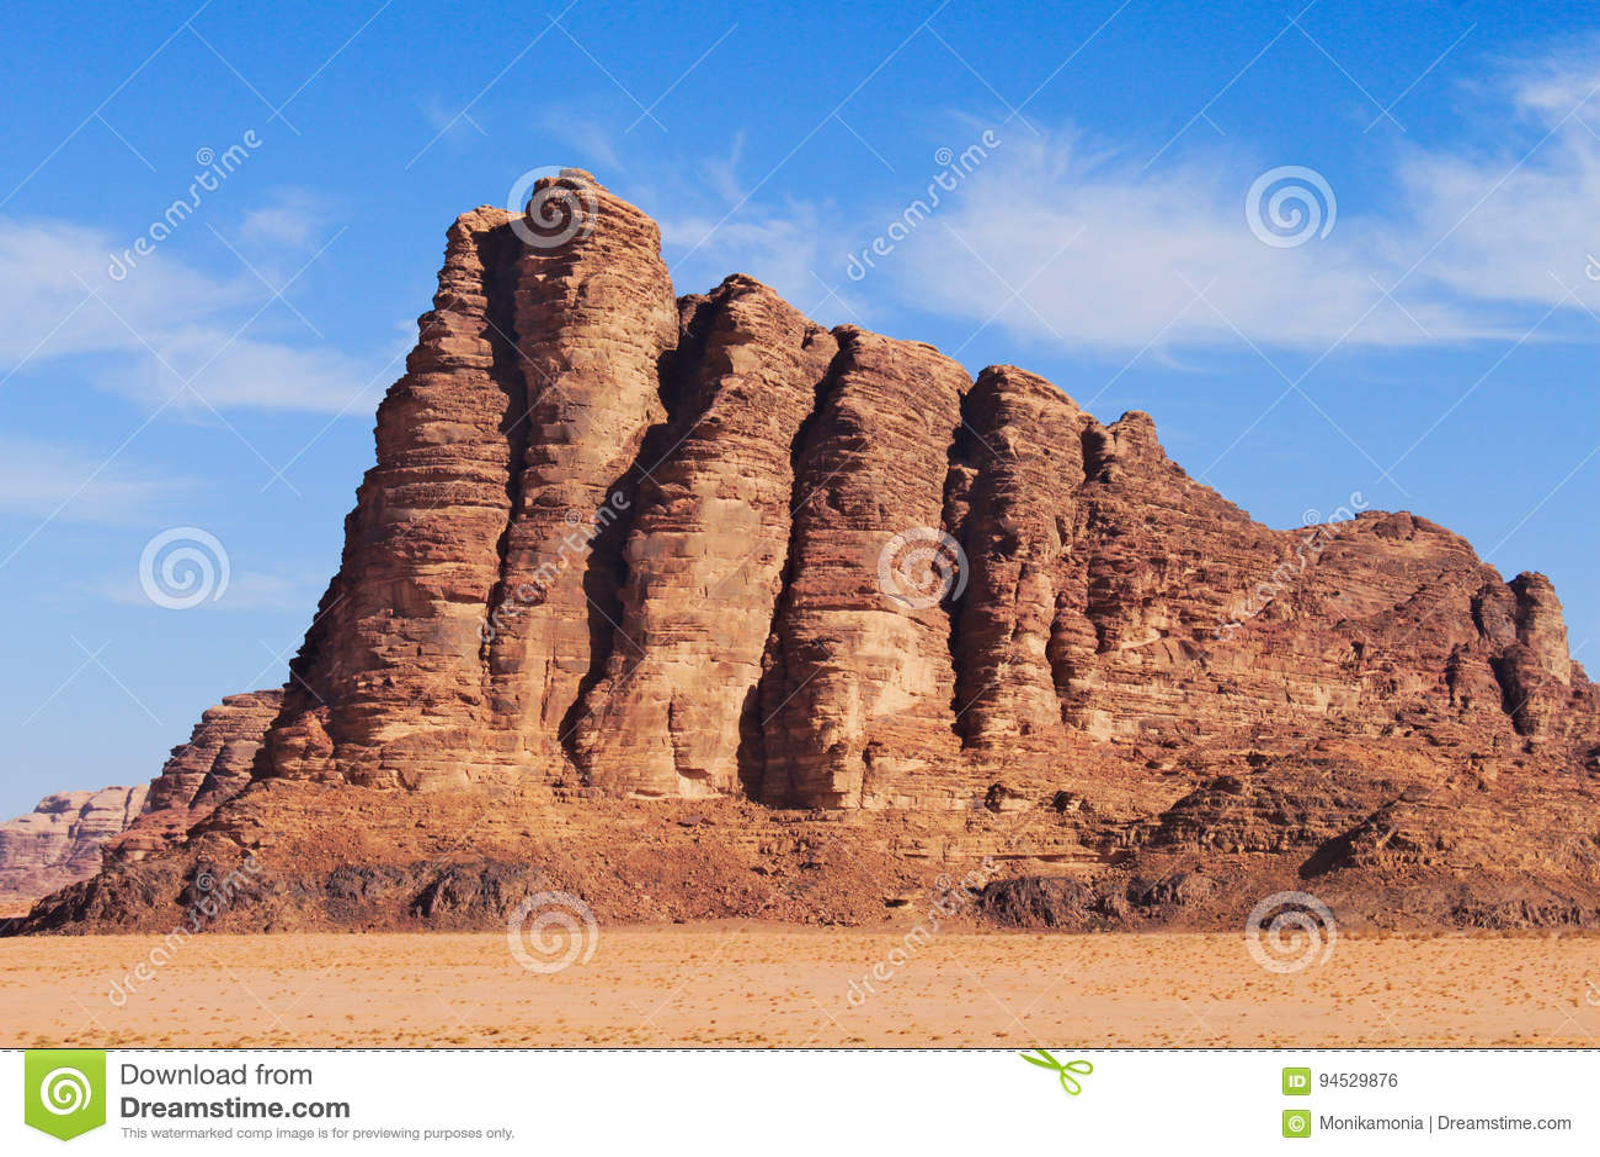 Seven pillars of wisdom on Wadi Rum desert in Jordan